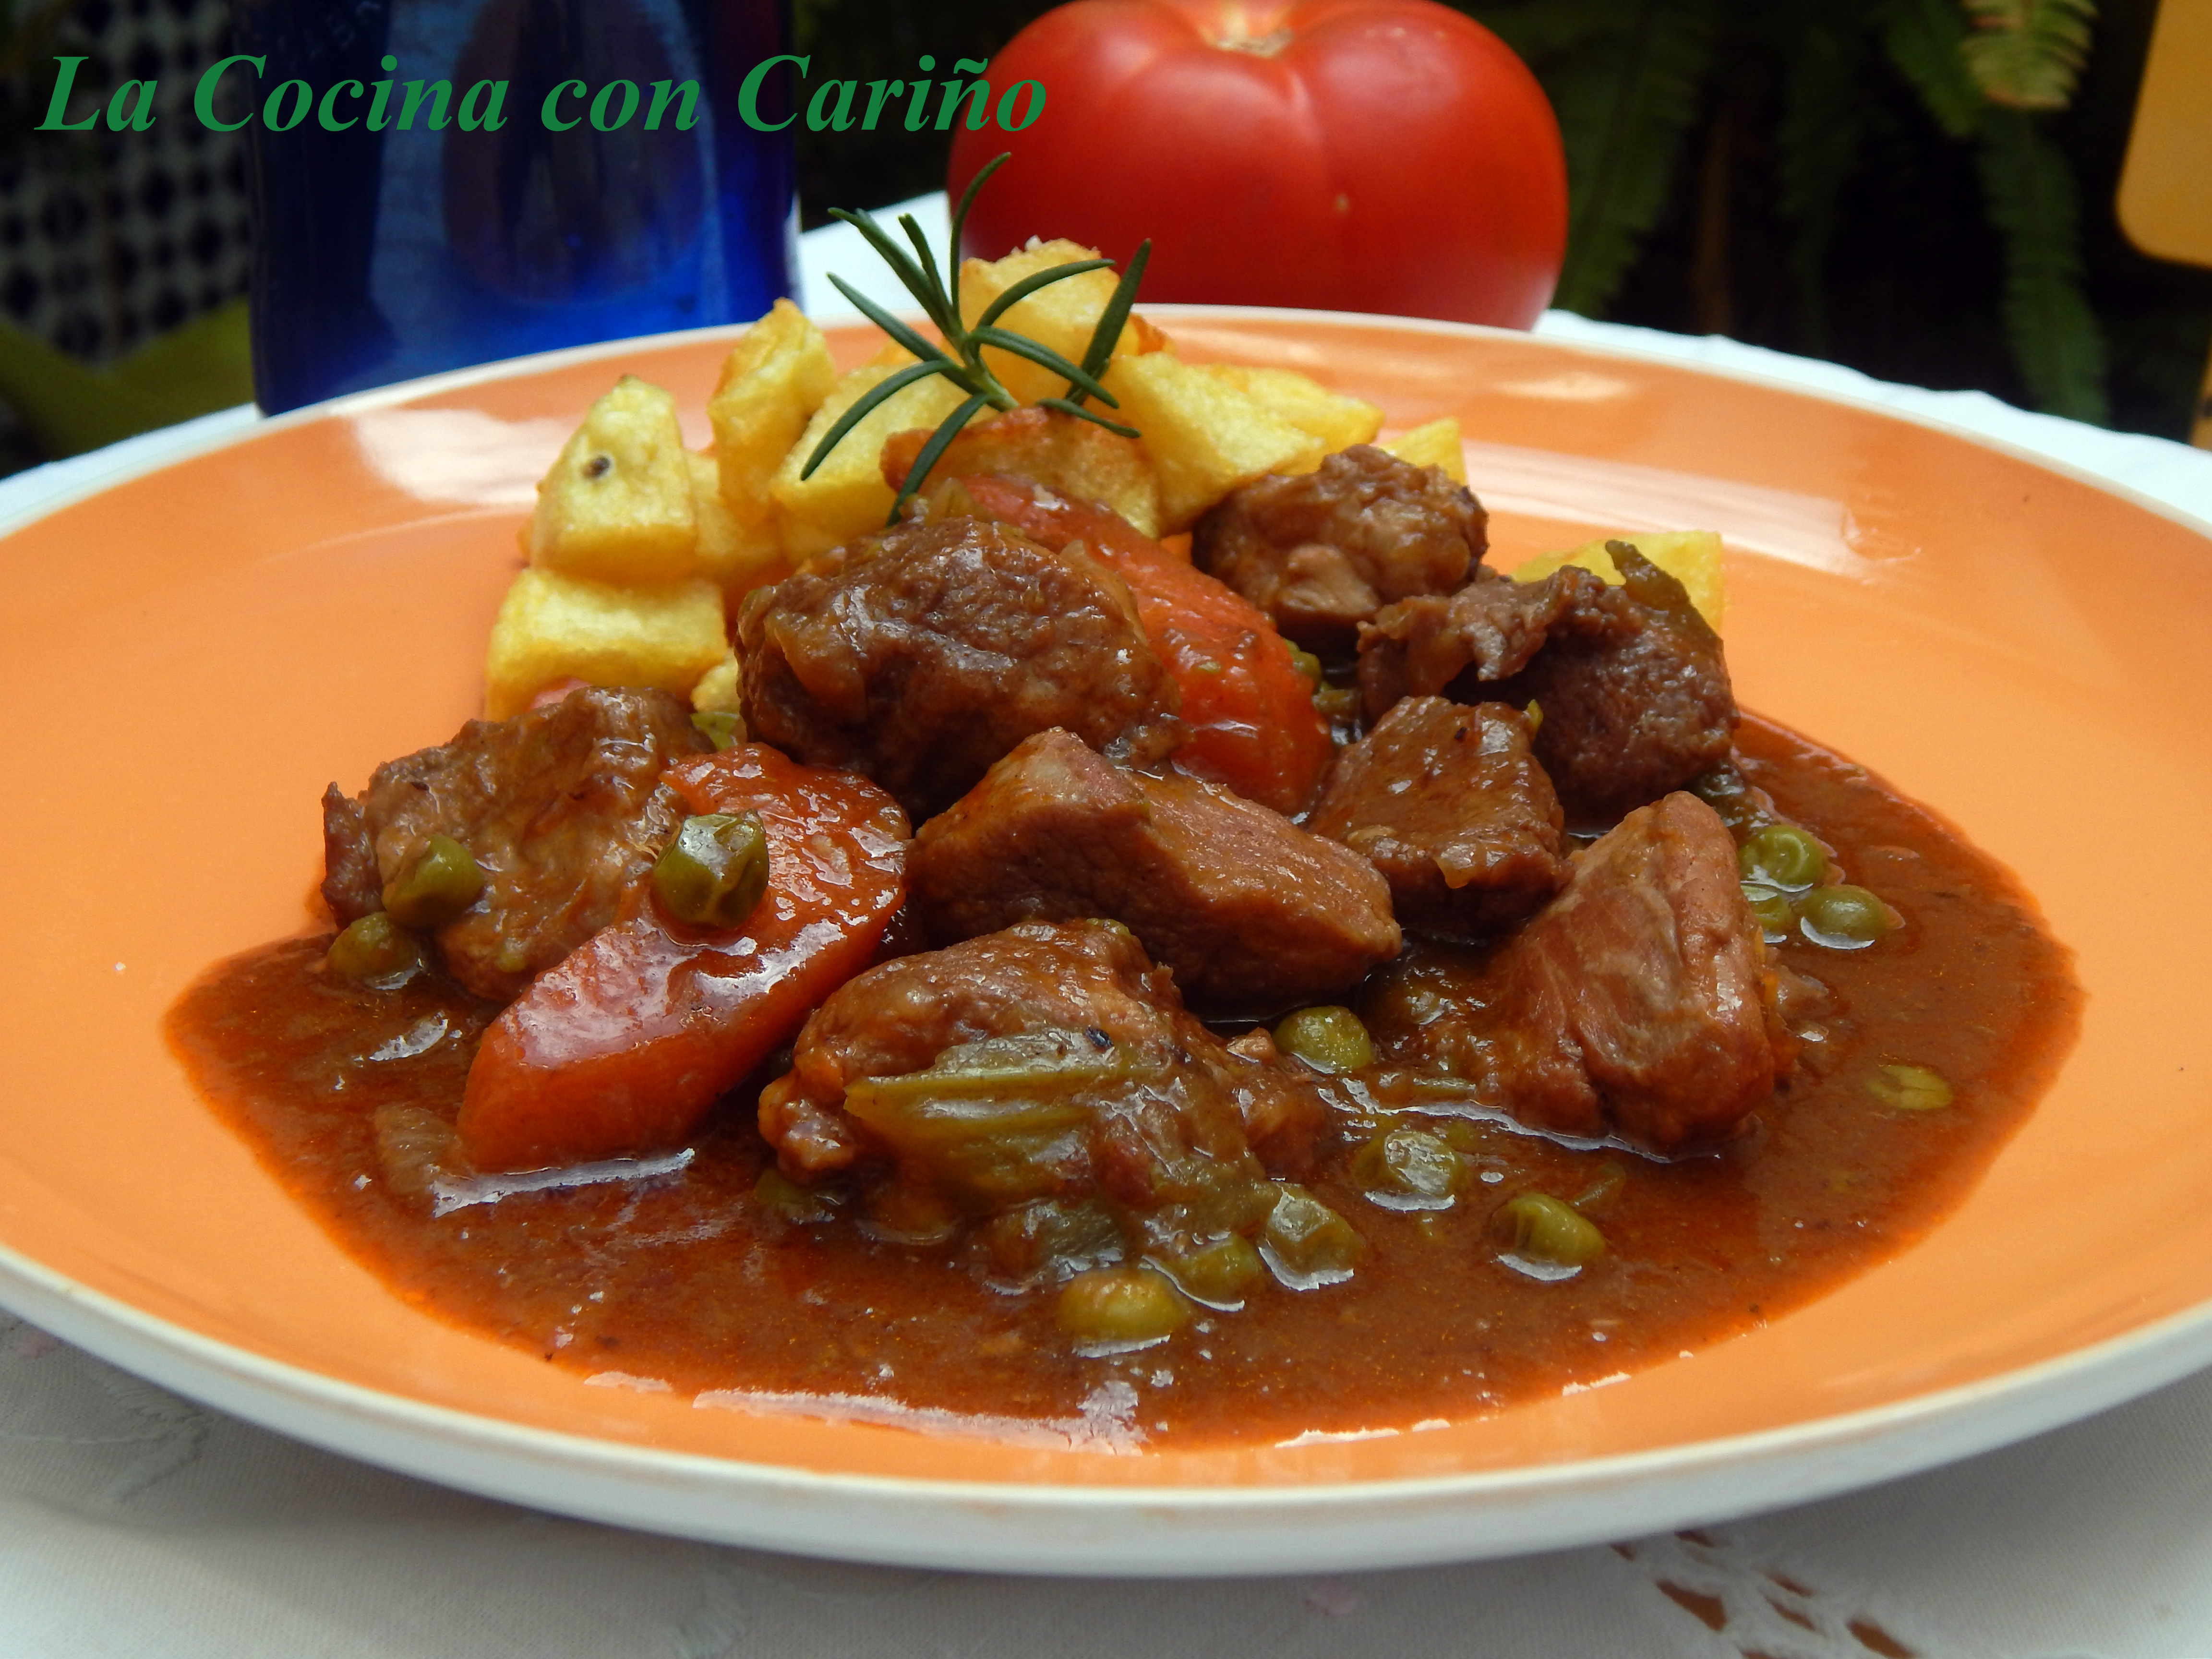 Estofado irland s de cerdo molinillo receta canal cocina - Guiso de carne de cerdo ...